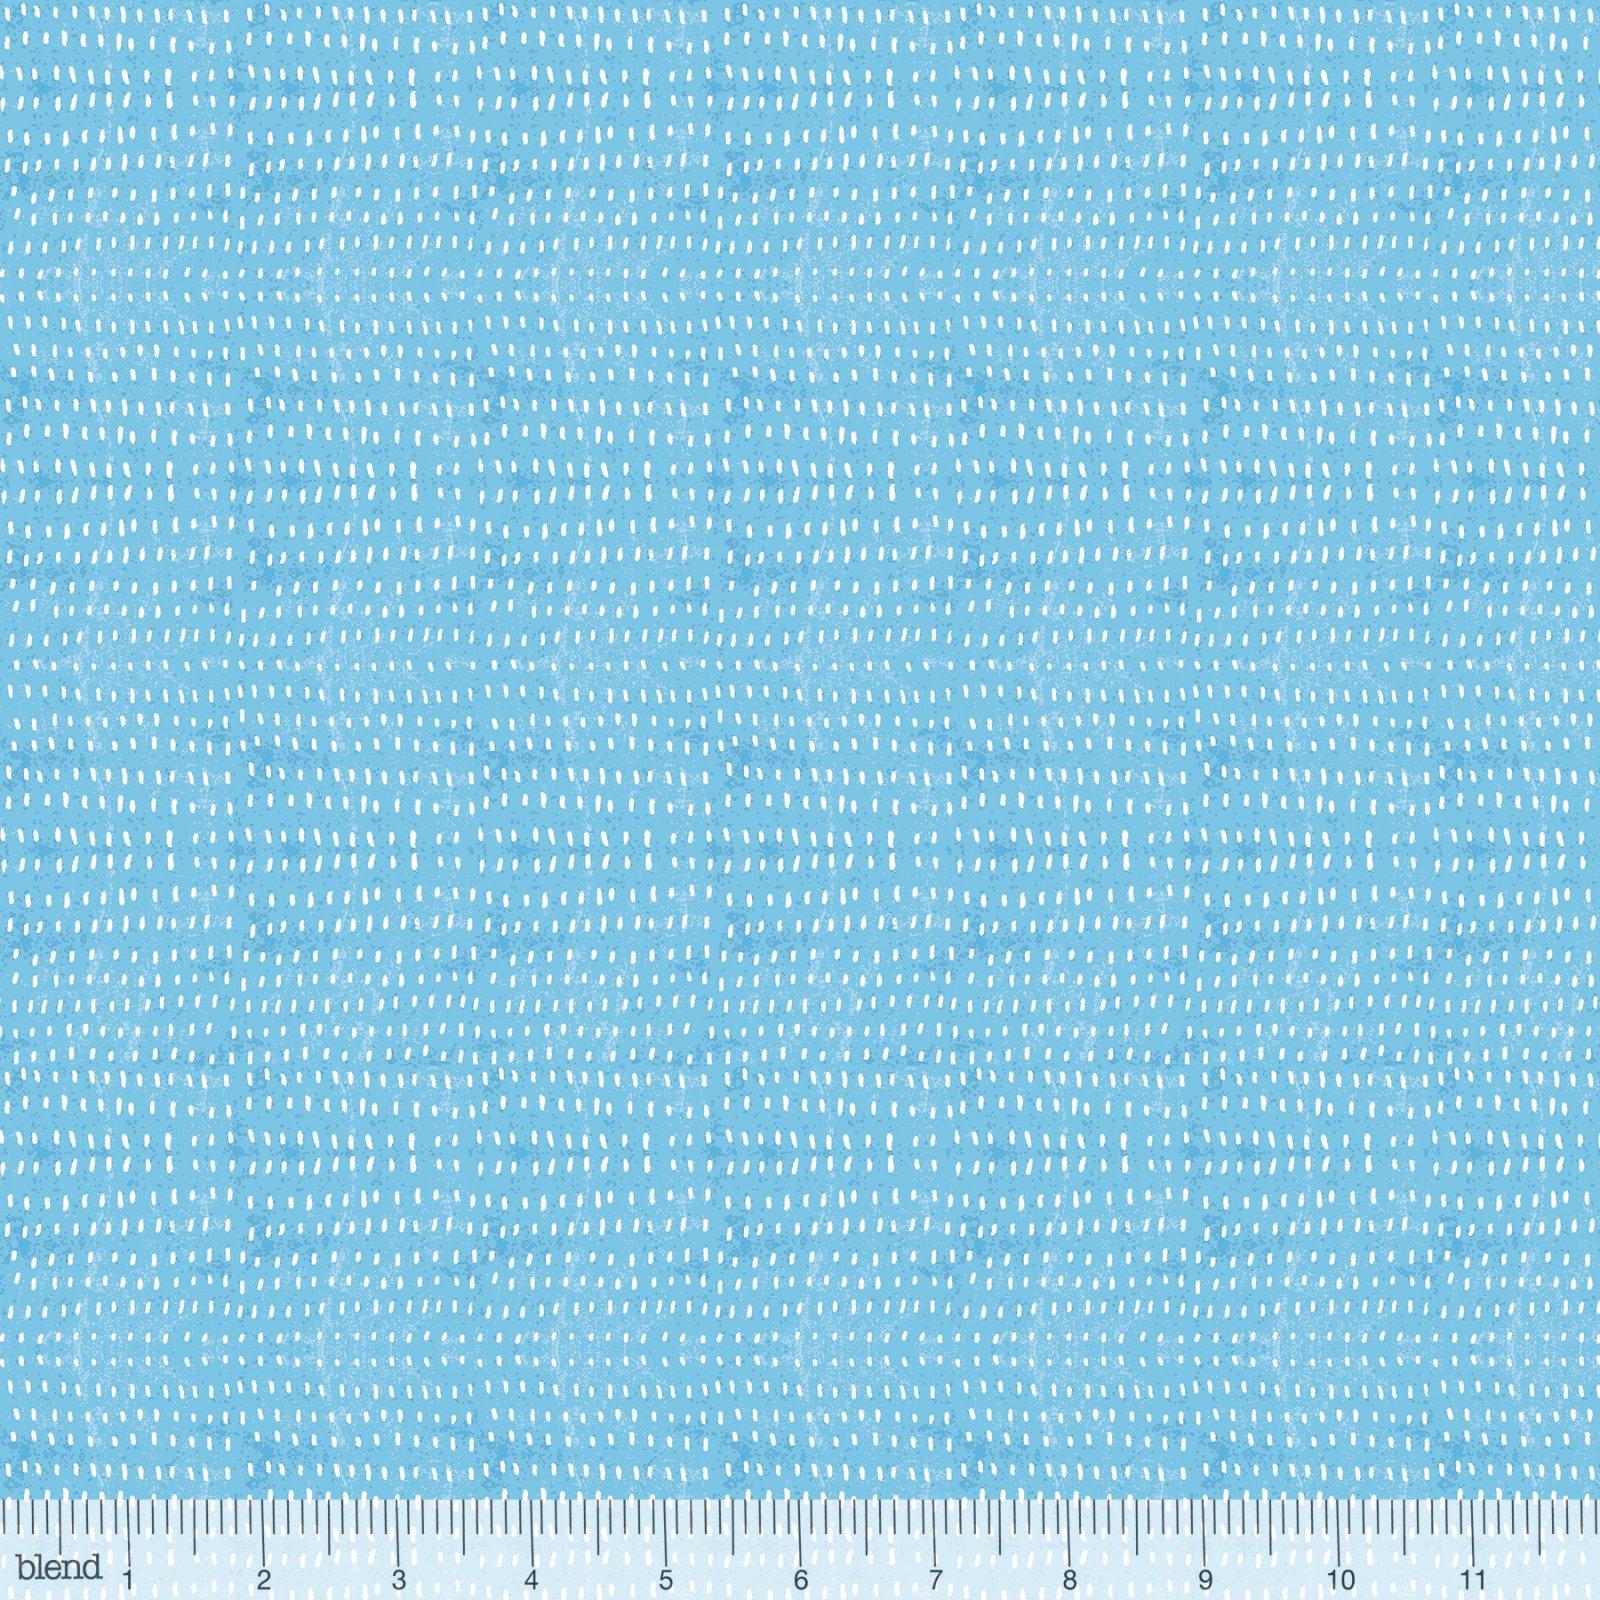 112.114.10 Sky Seeds Cori Dantini Blend Fabrics